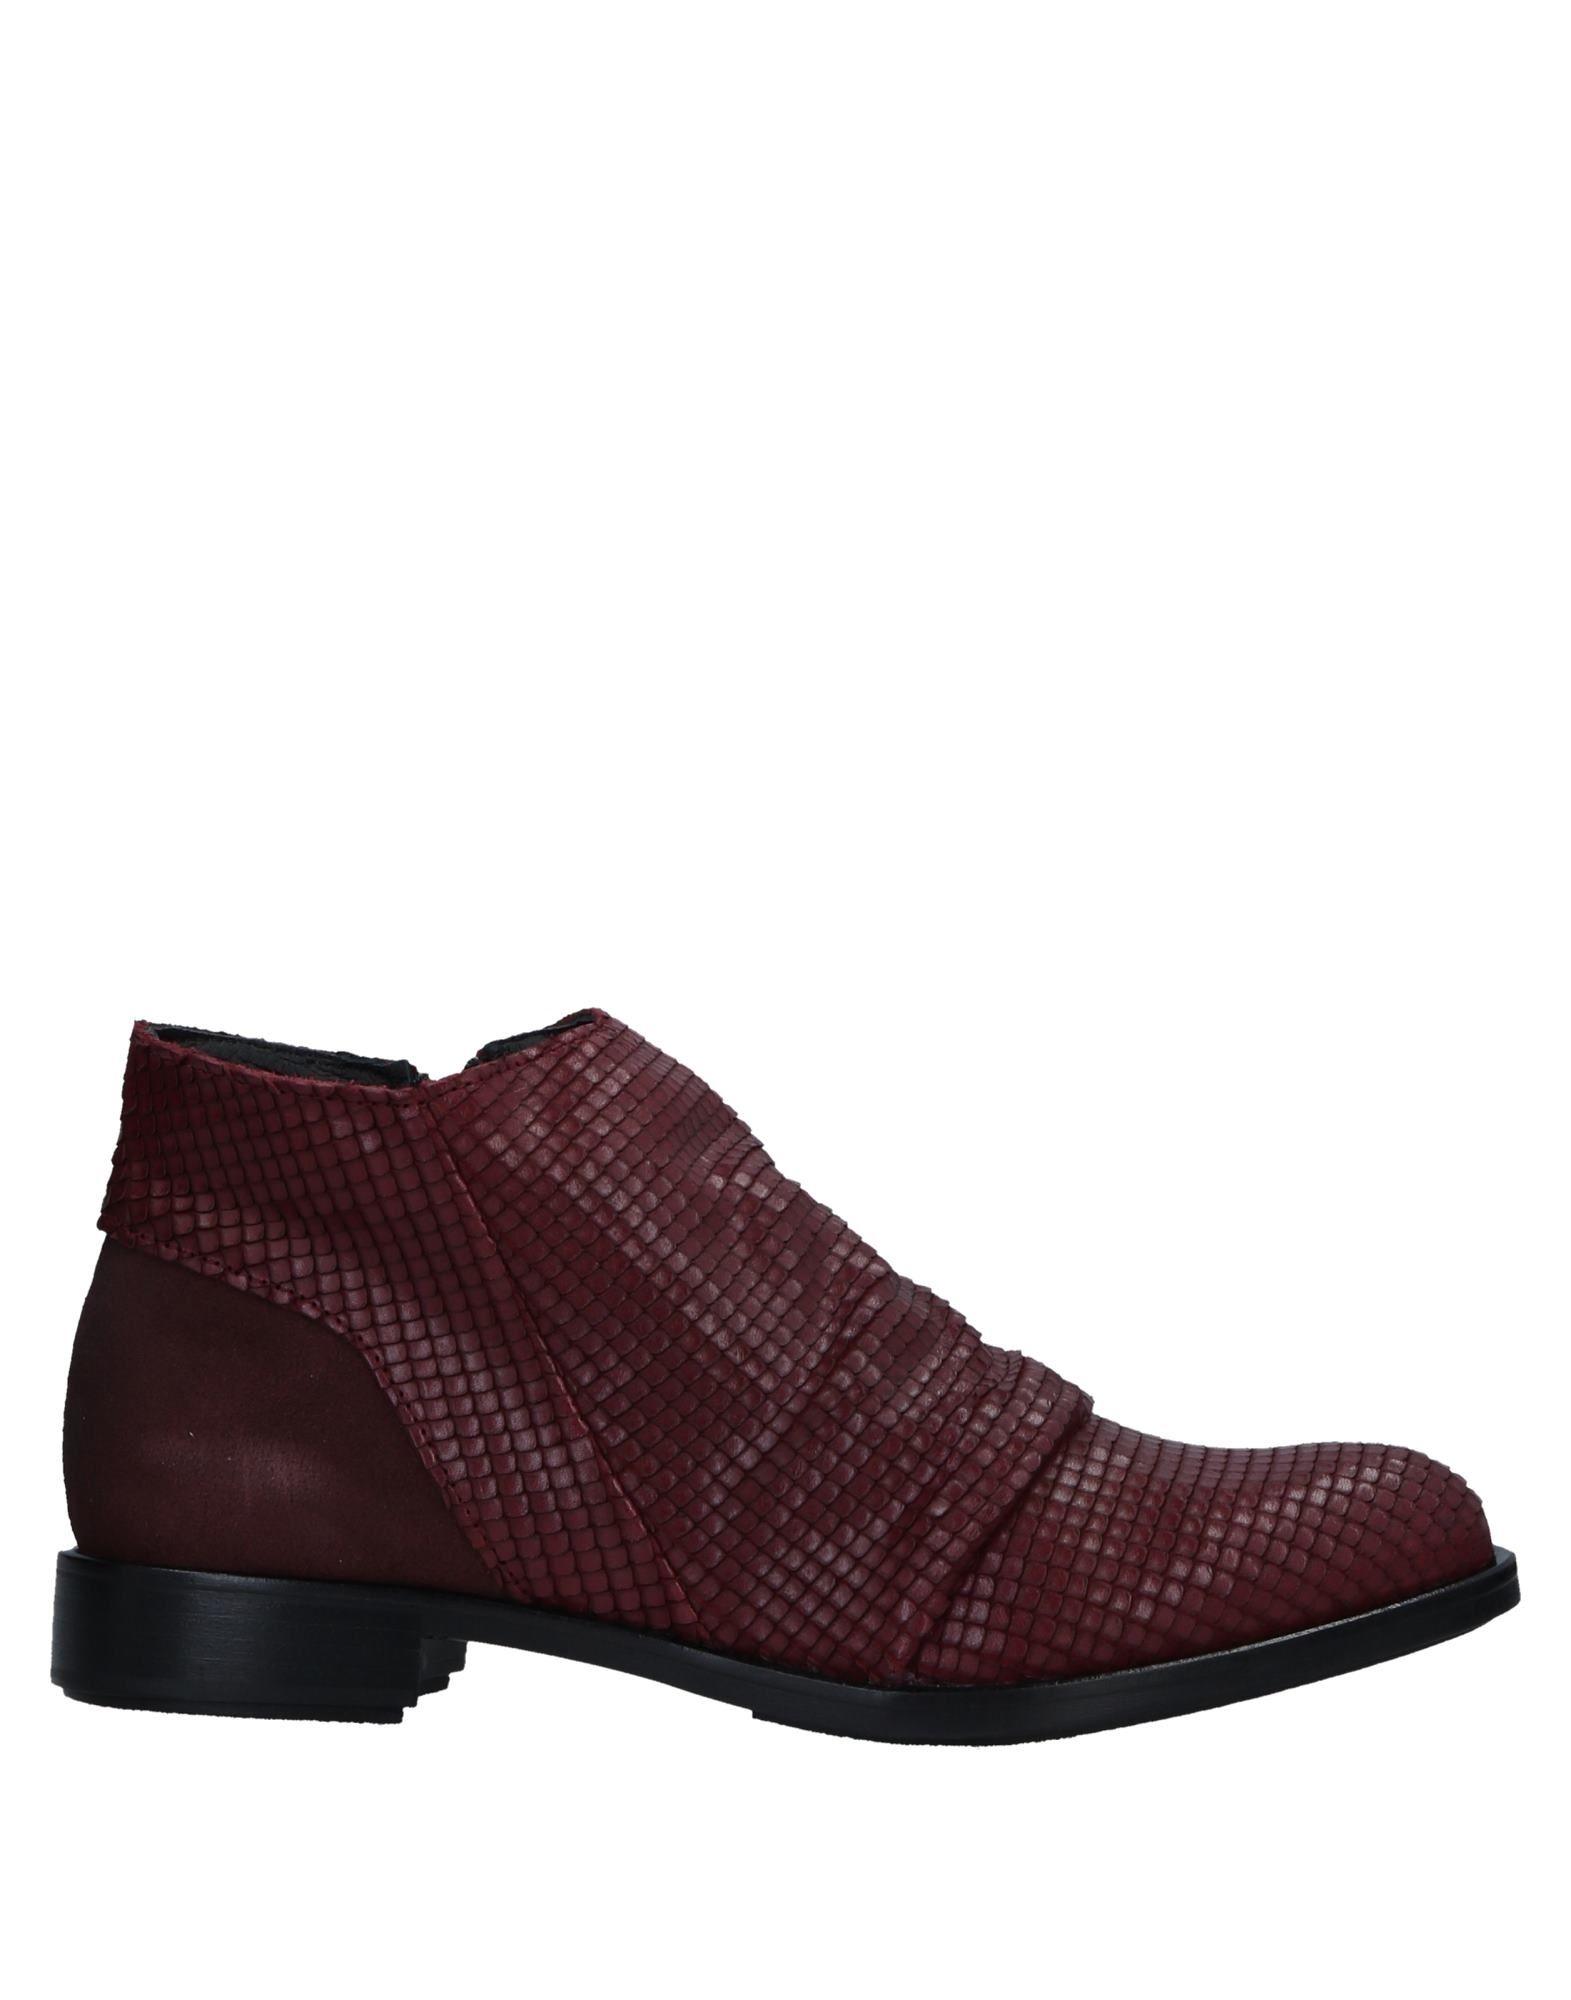 Lilimill Stiefelette Damen  11524124OG Gute Qualität beliebte Schuhe